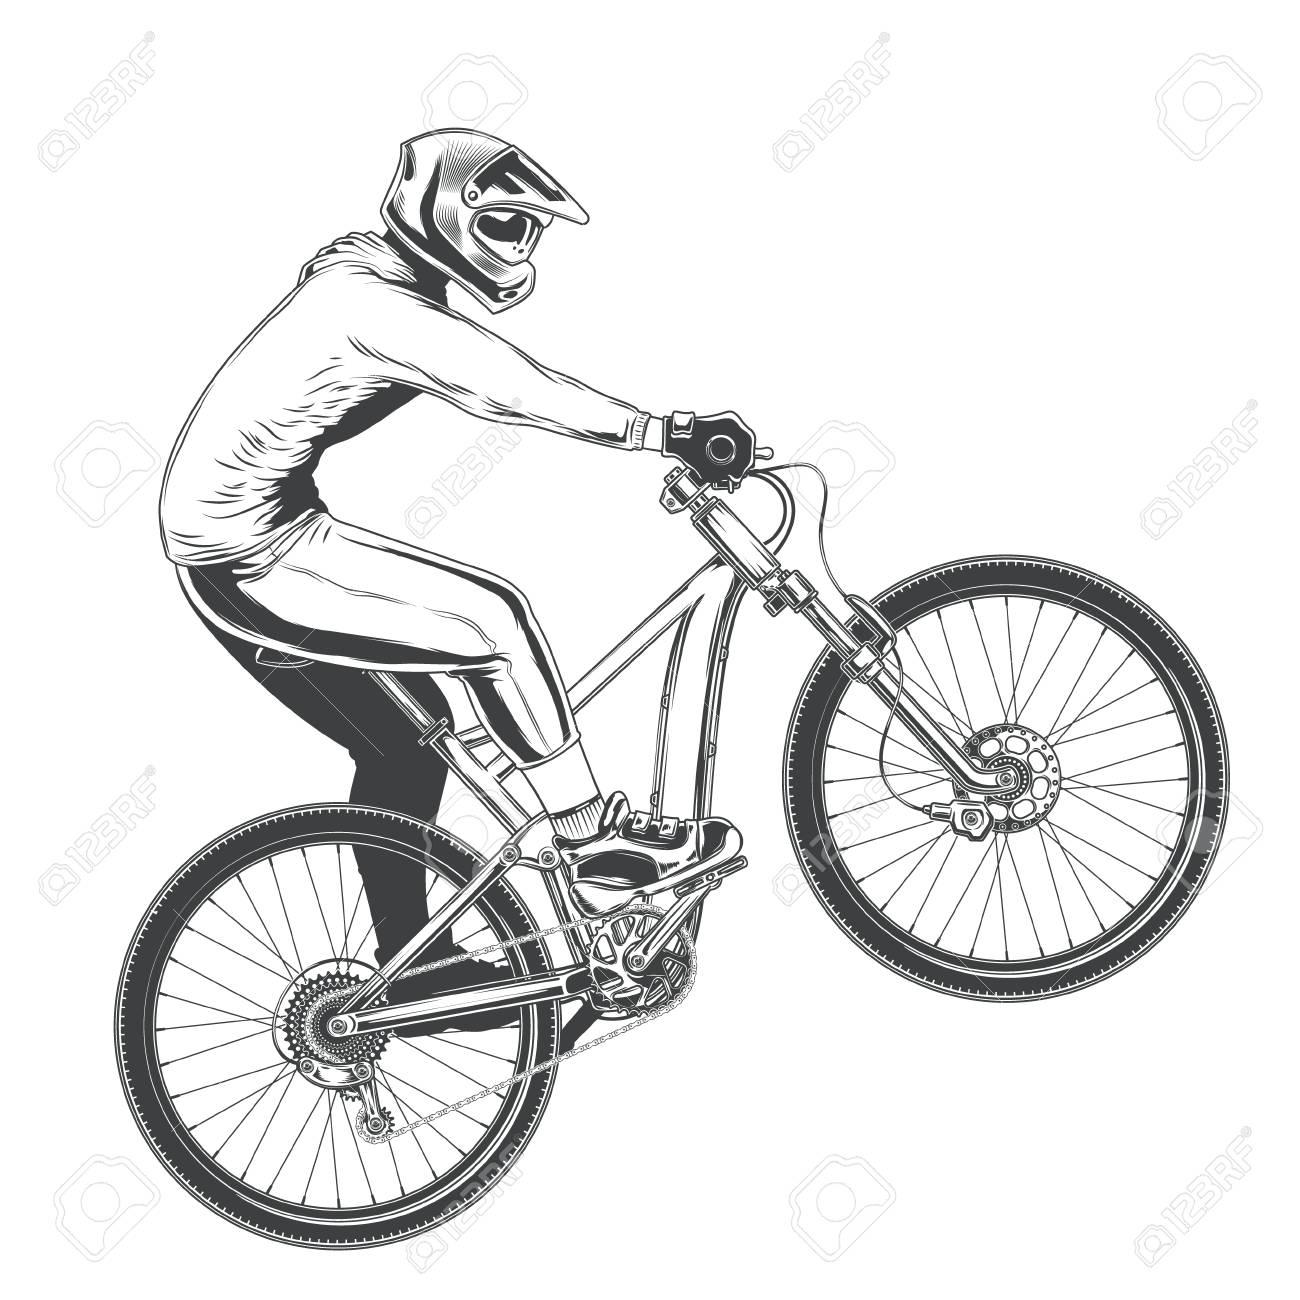 f087110f93 Foto de archivo - Paseo en bicicleta deportiva, ciclista de BMX realizando  un truco, competencia de bicicleta de montaña, ilustración vectorial negro  ...